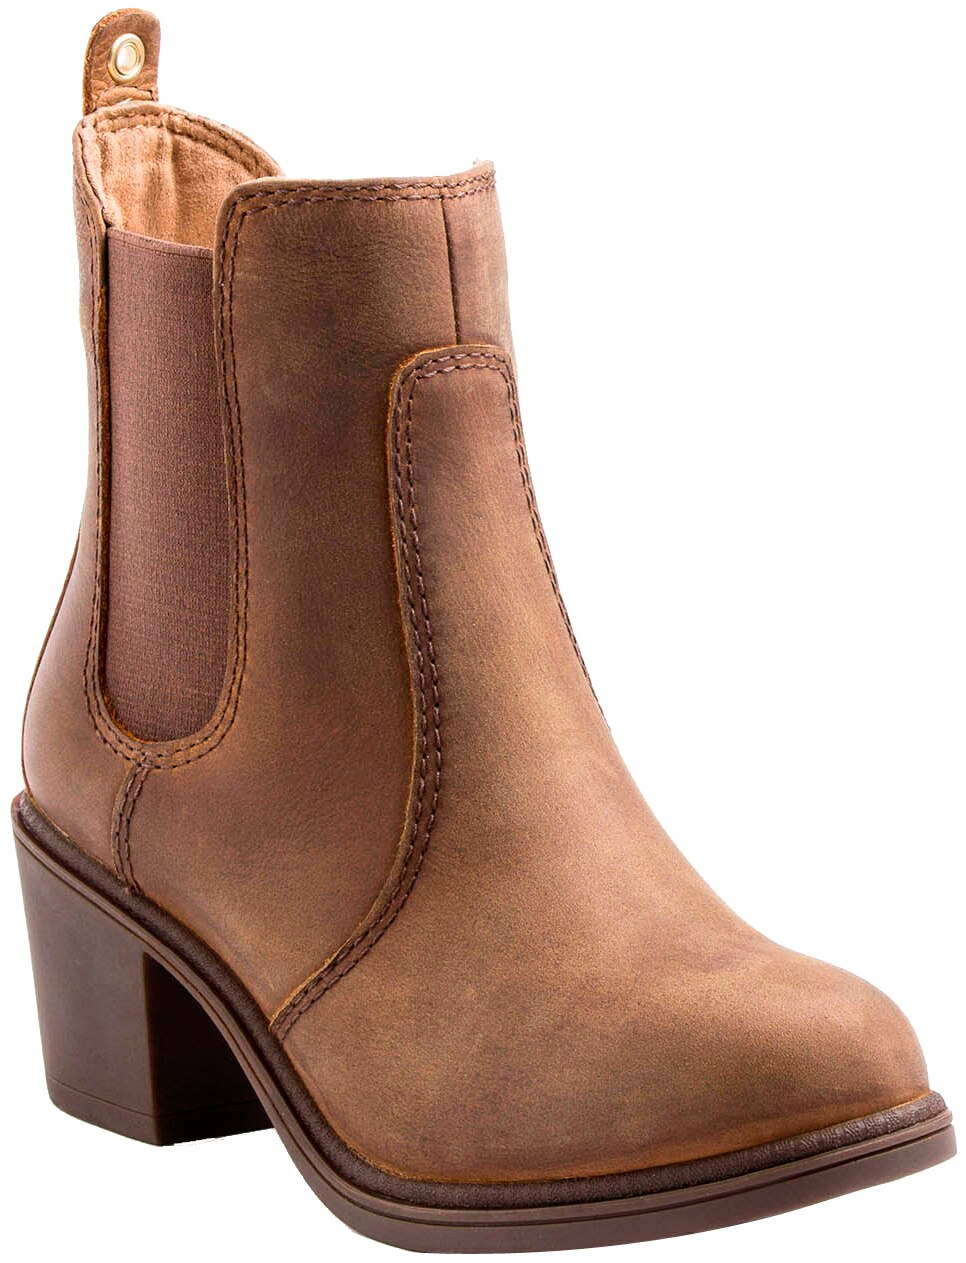 Kodiak Henna Waterproof Leather Ankle Boot